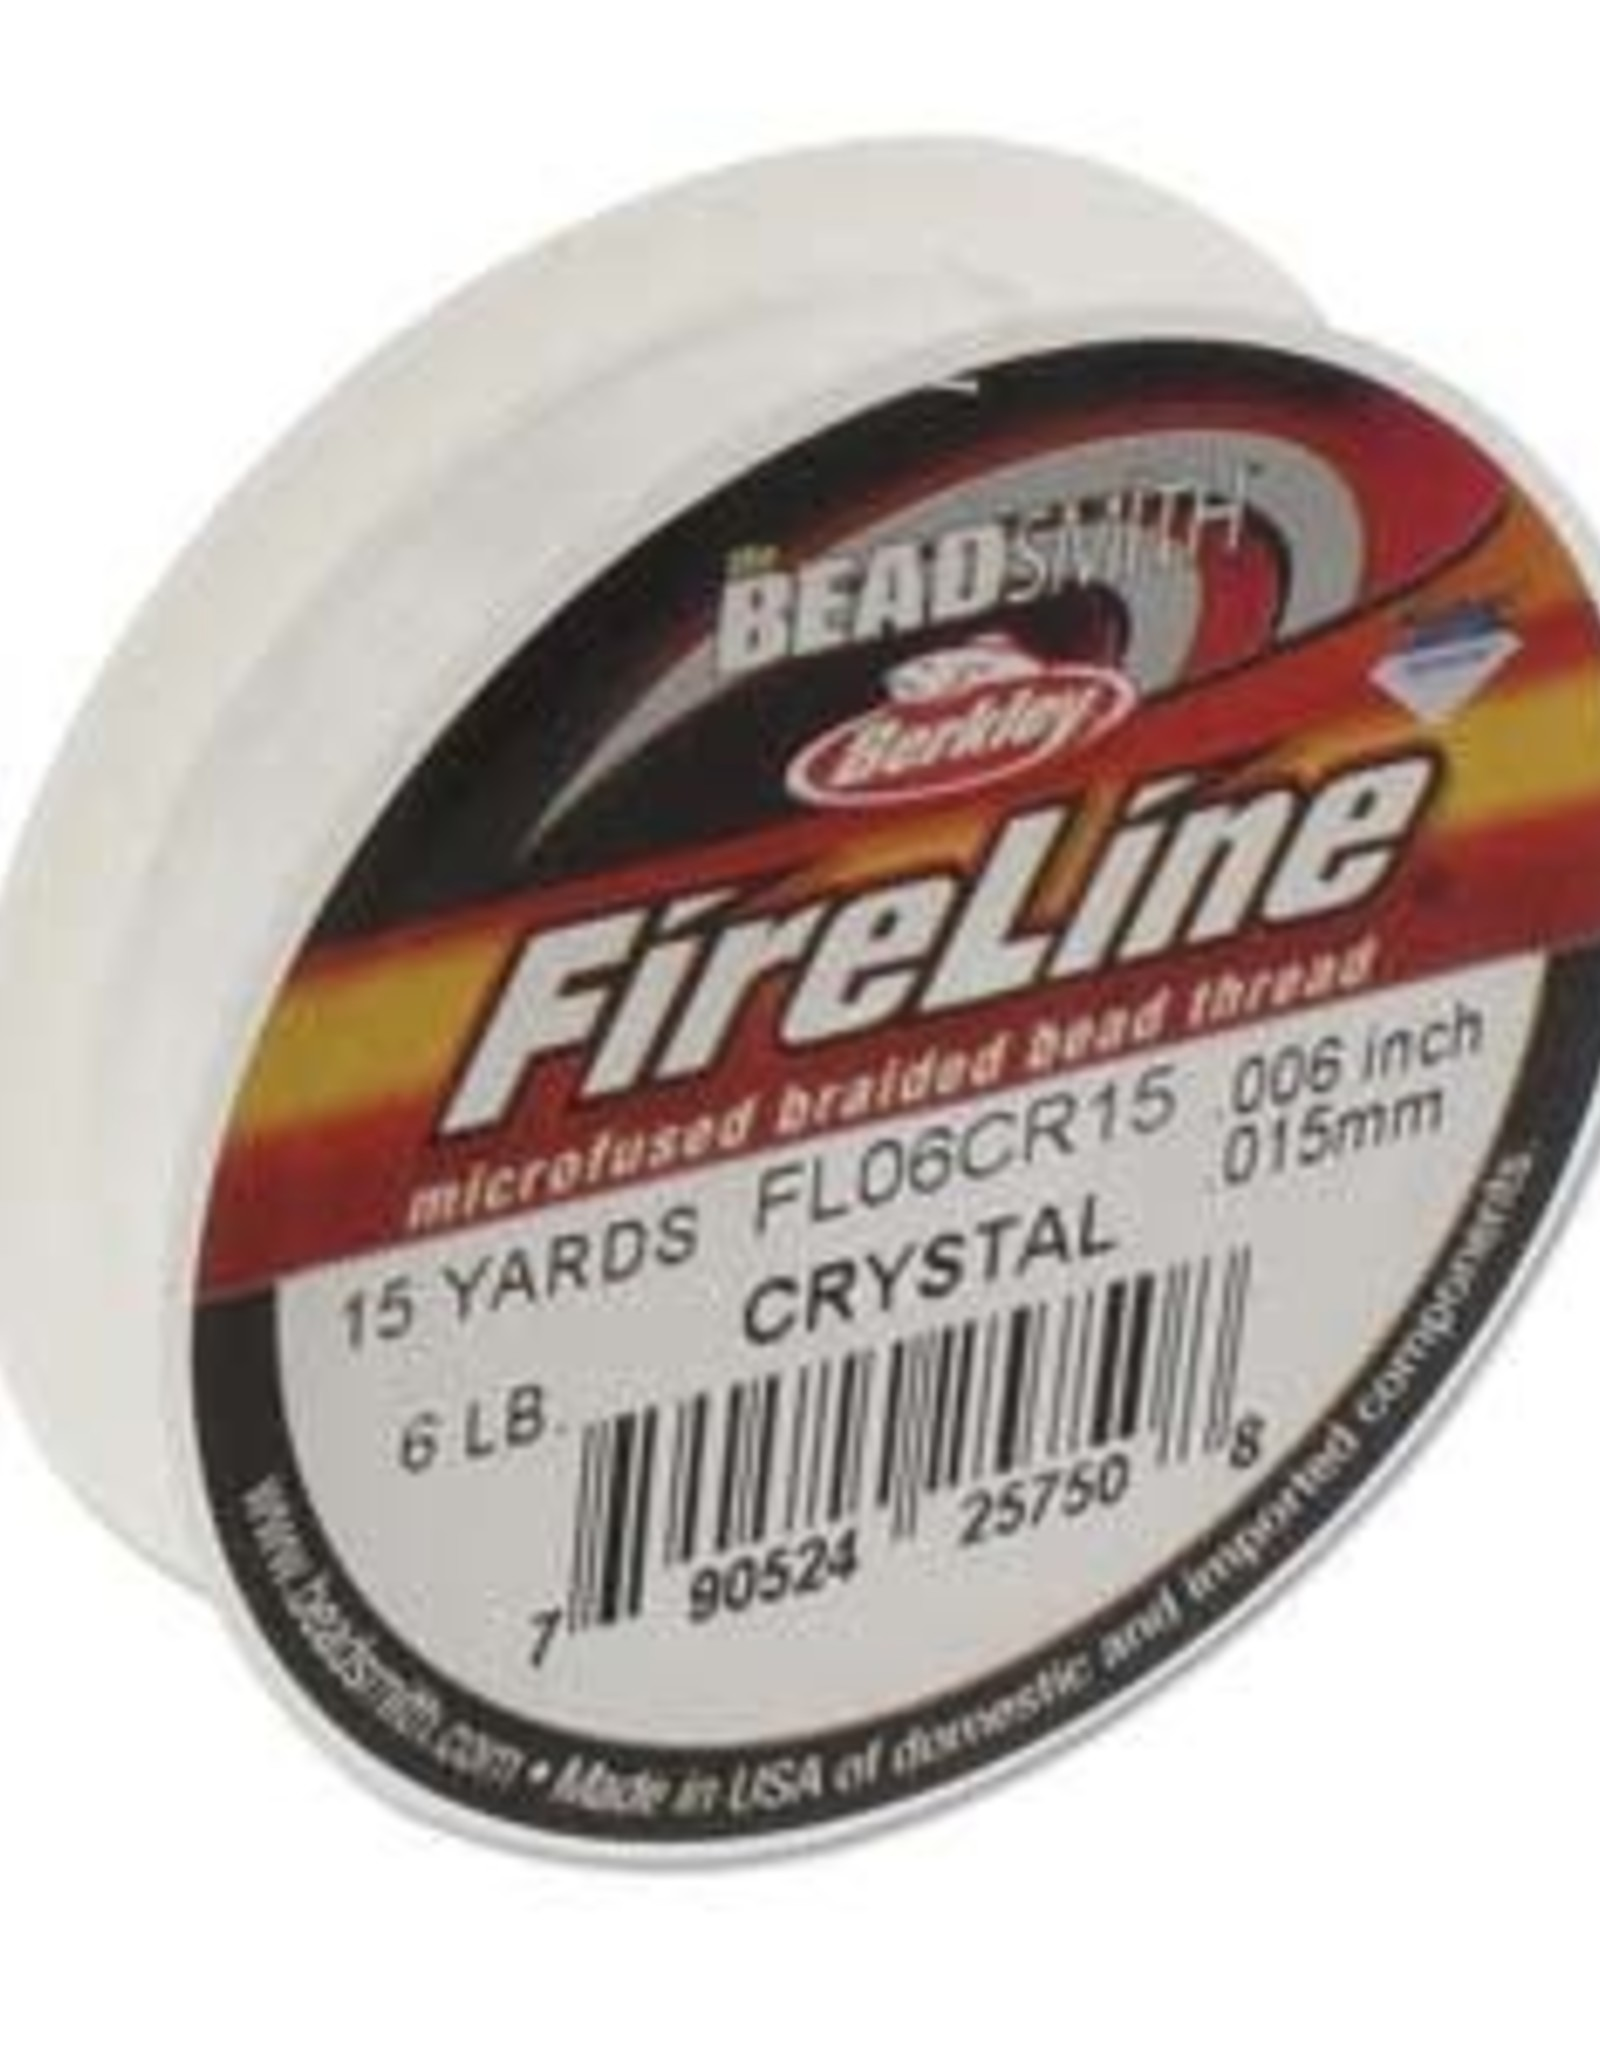 FireLine 6lb Crystal 15 yards